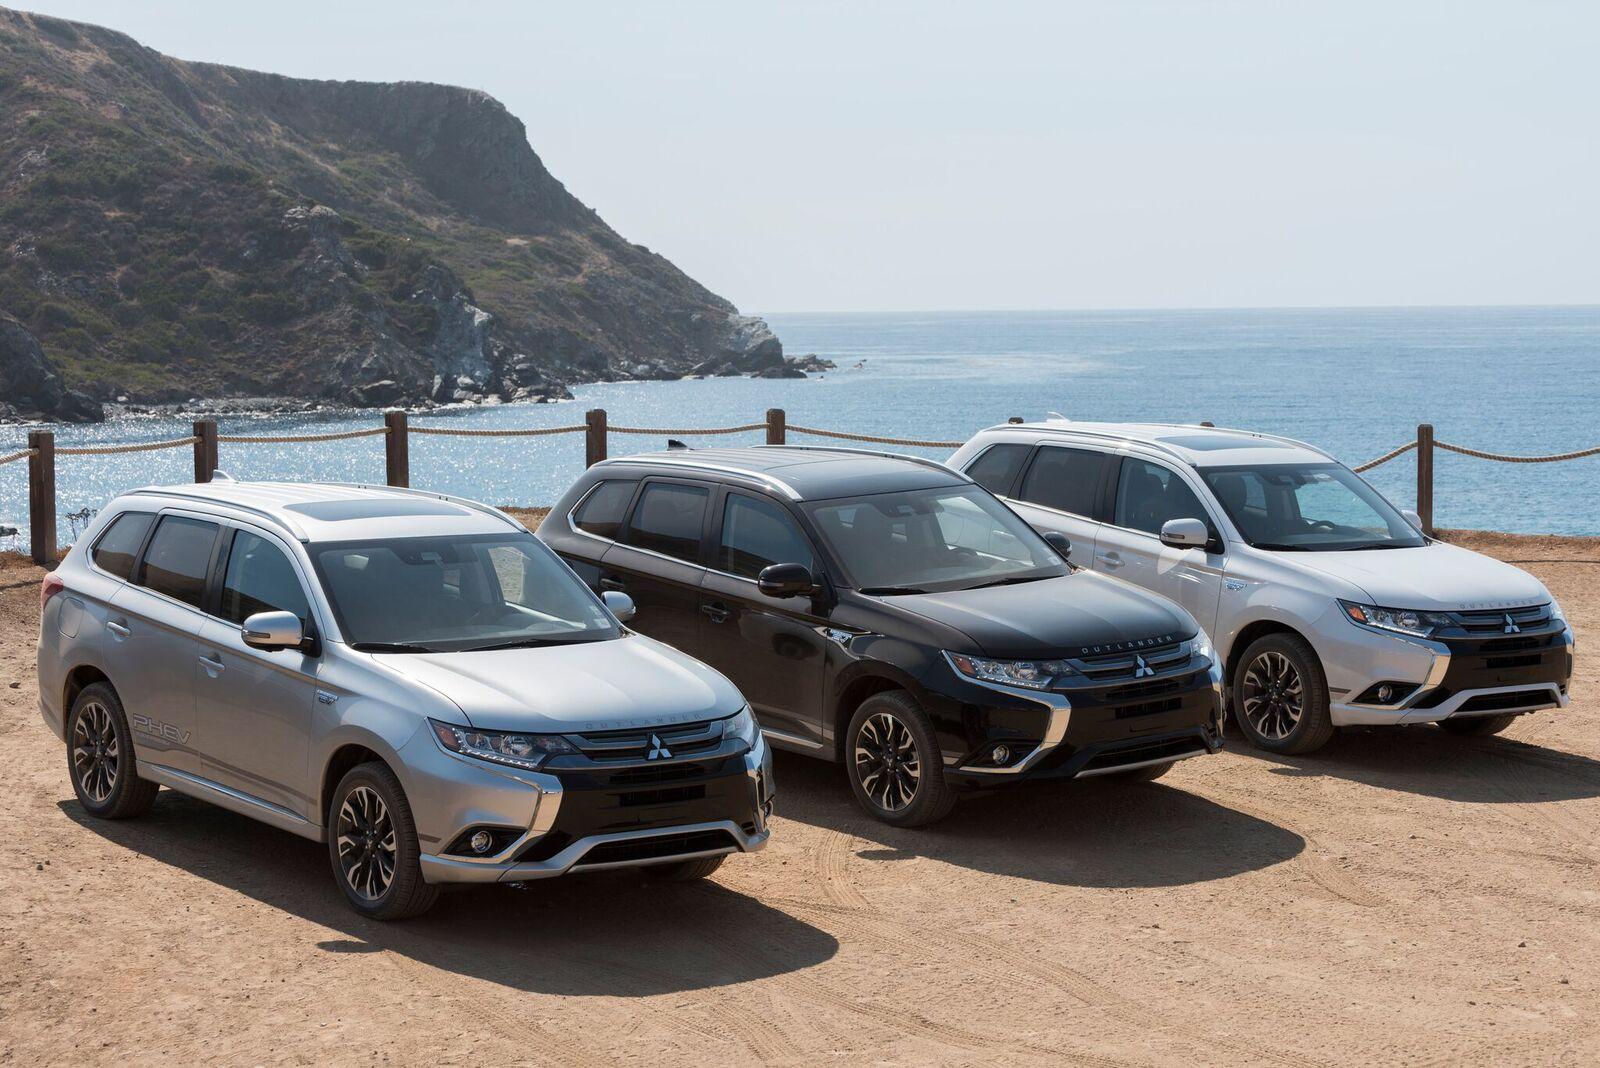 What's Unique About the 2018 Mitsubishi Outlander PHEV?